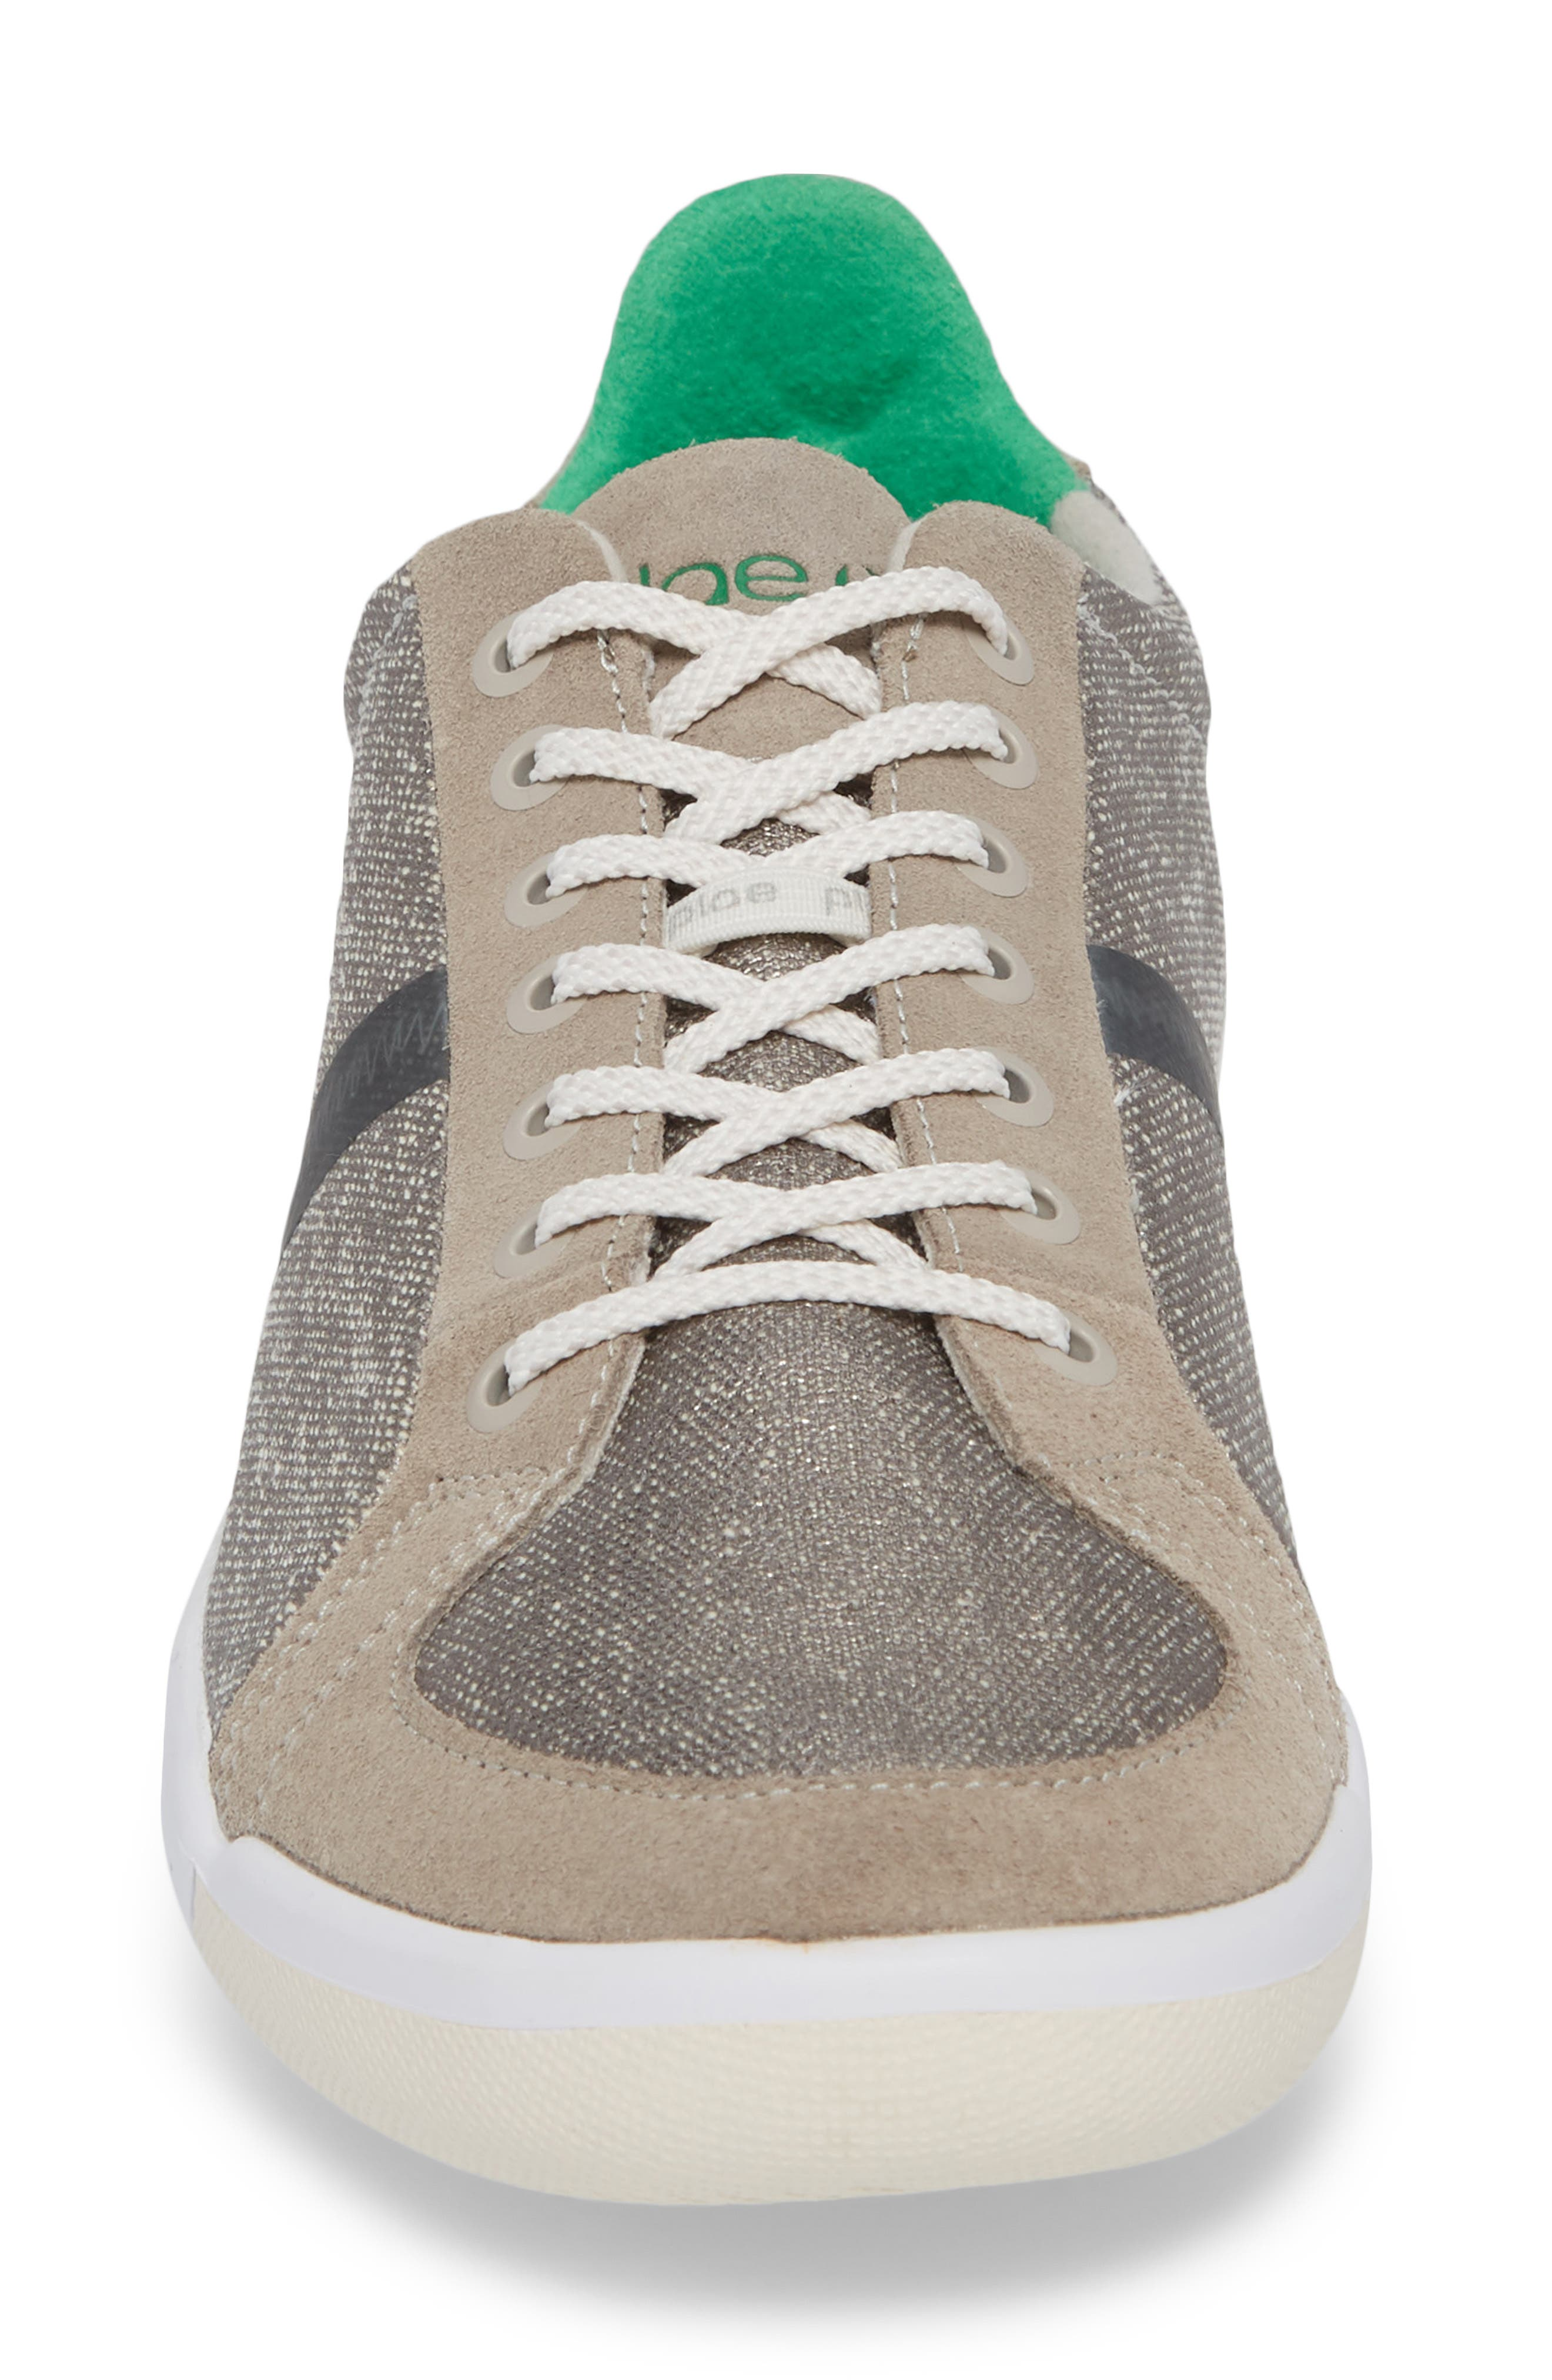 Prospect Low Top Sneaker,                             Alternate thumbnail 4, color,                             STONE